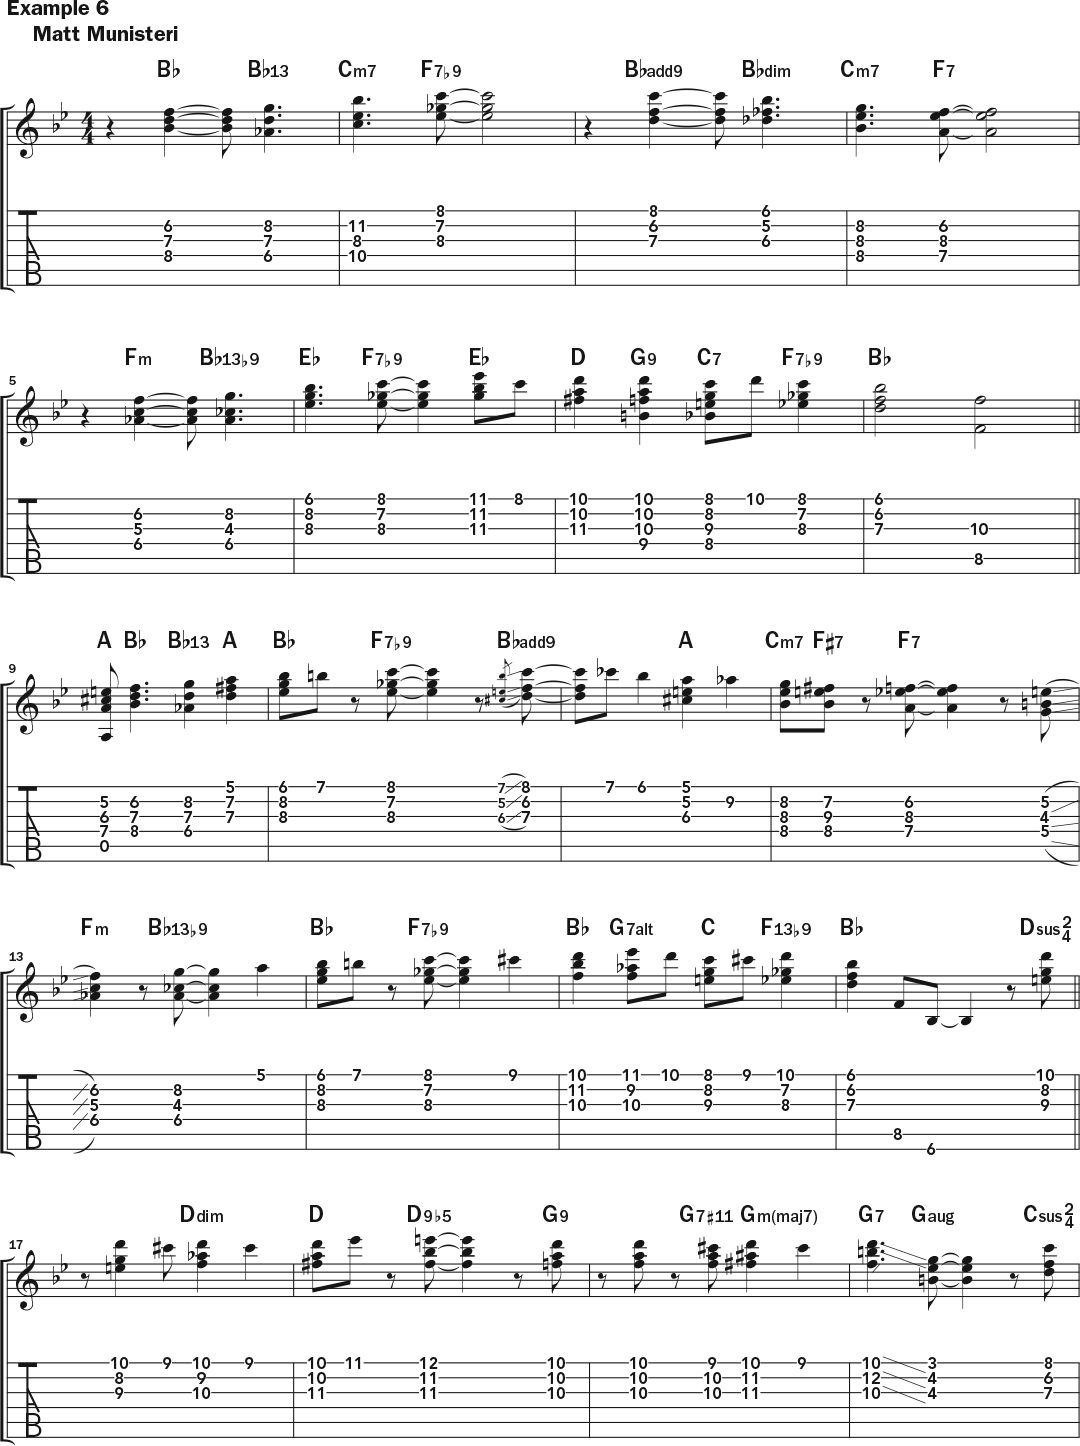 AG304_rhythmchanges_6A